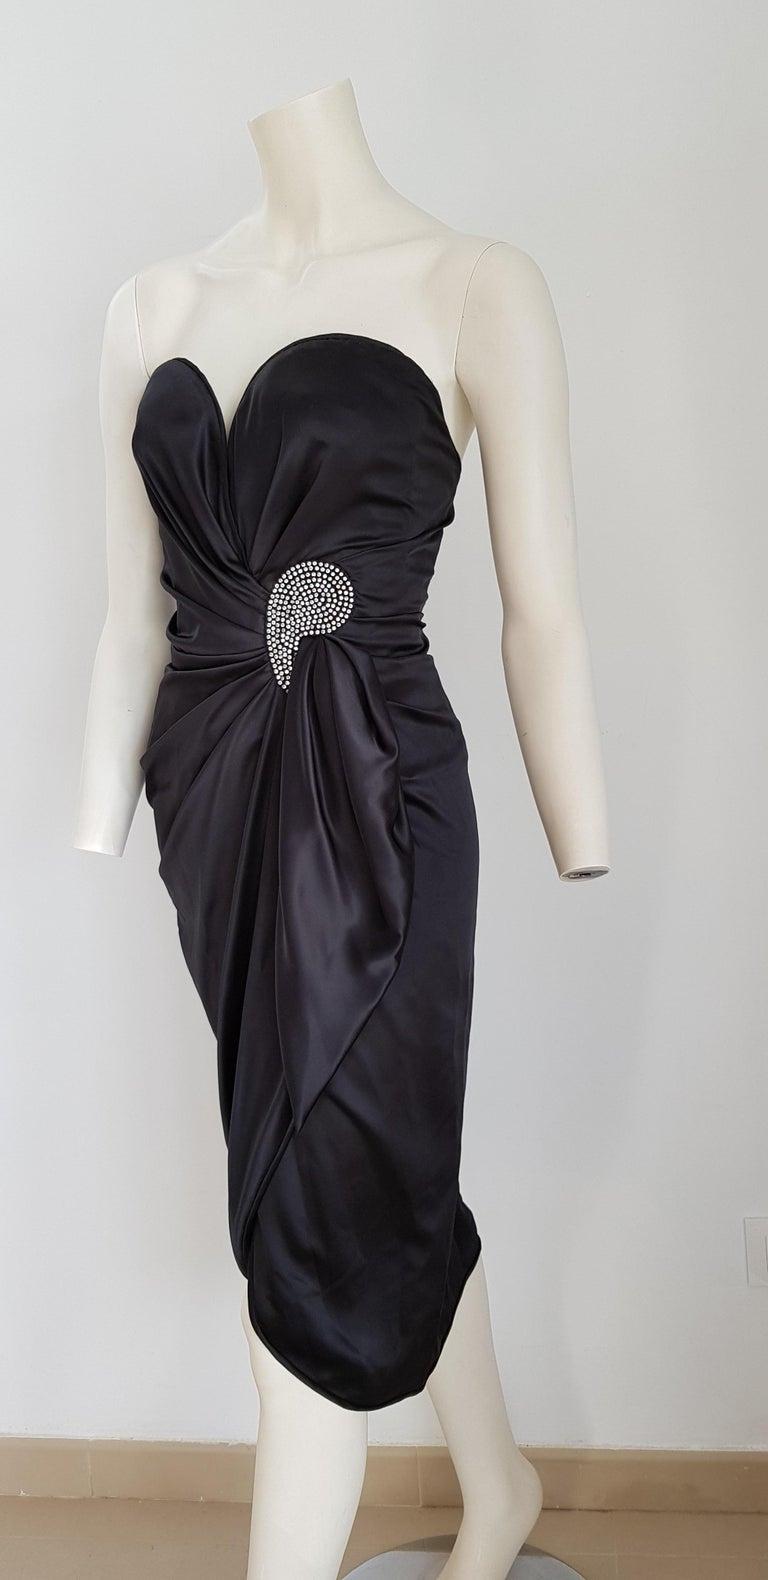 VALENTINO Haute Couture Swarovski Diamonds Drop in Front, Silk Gown- Unworn, New In New Condition For Sale In Somo (Santander), ES